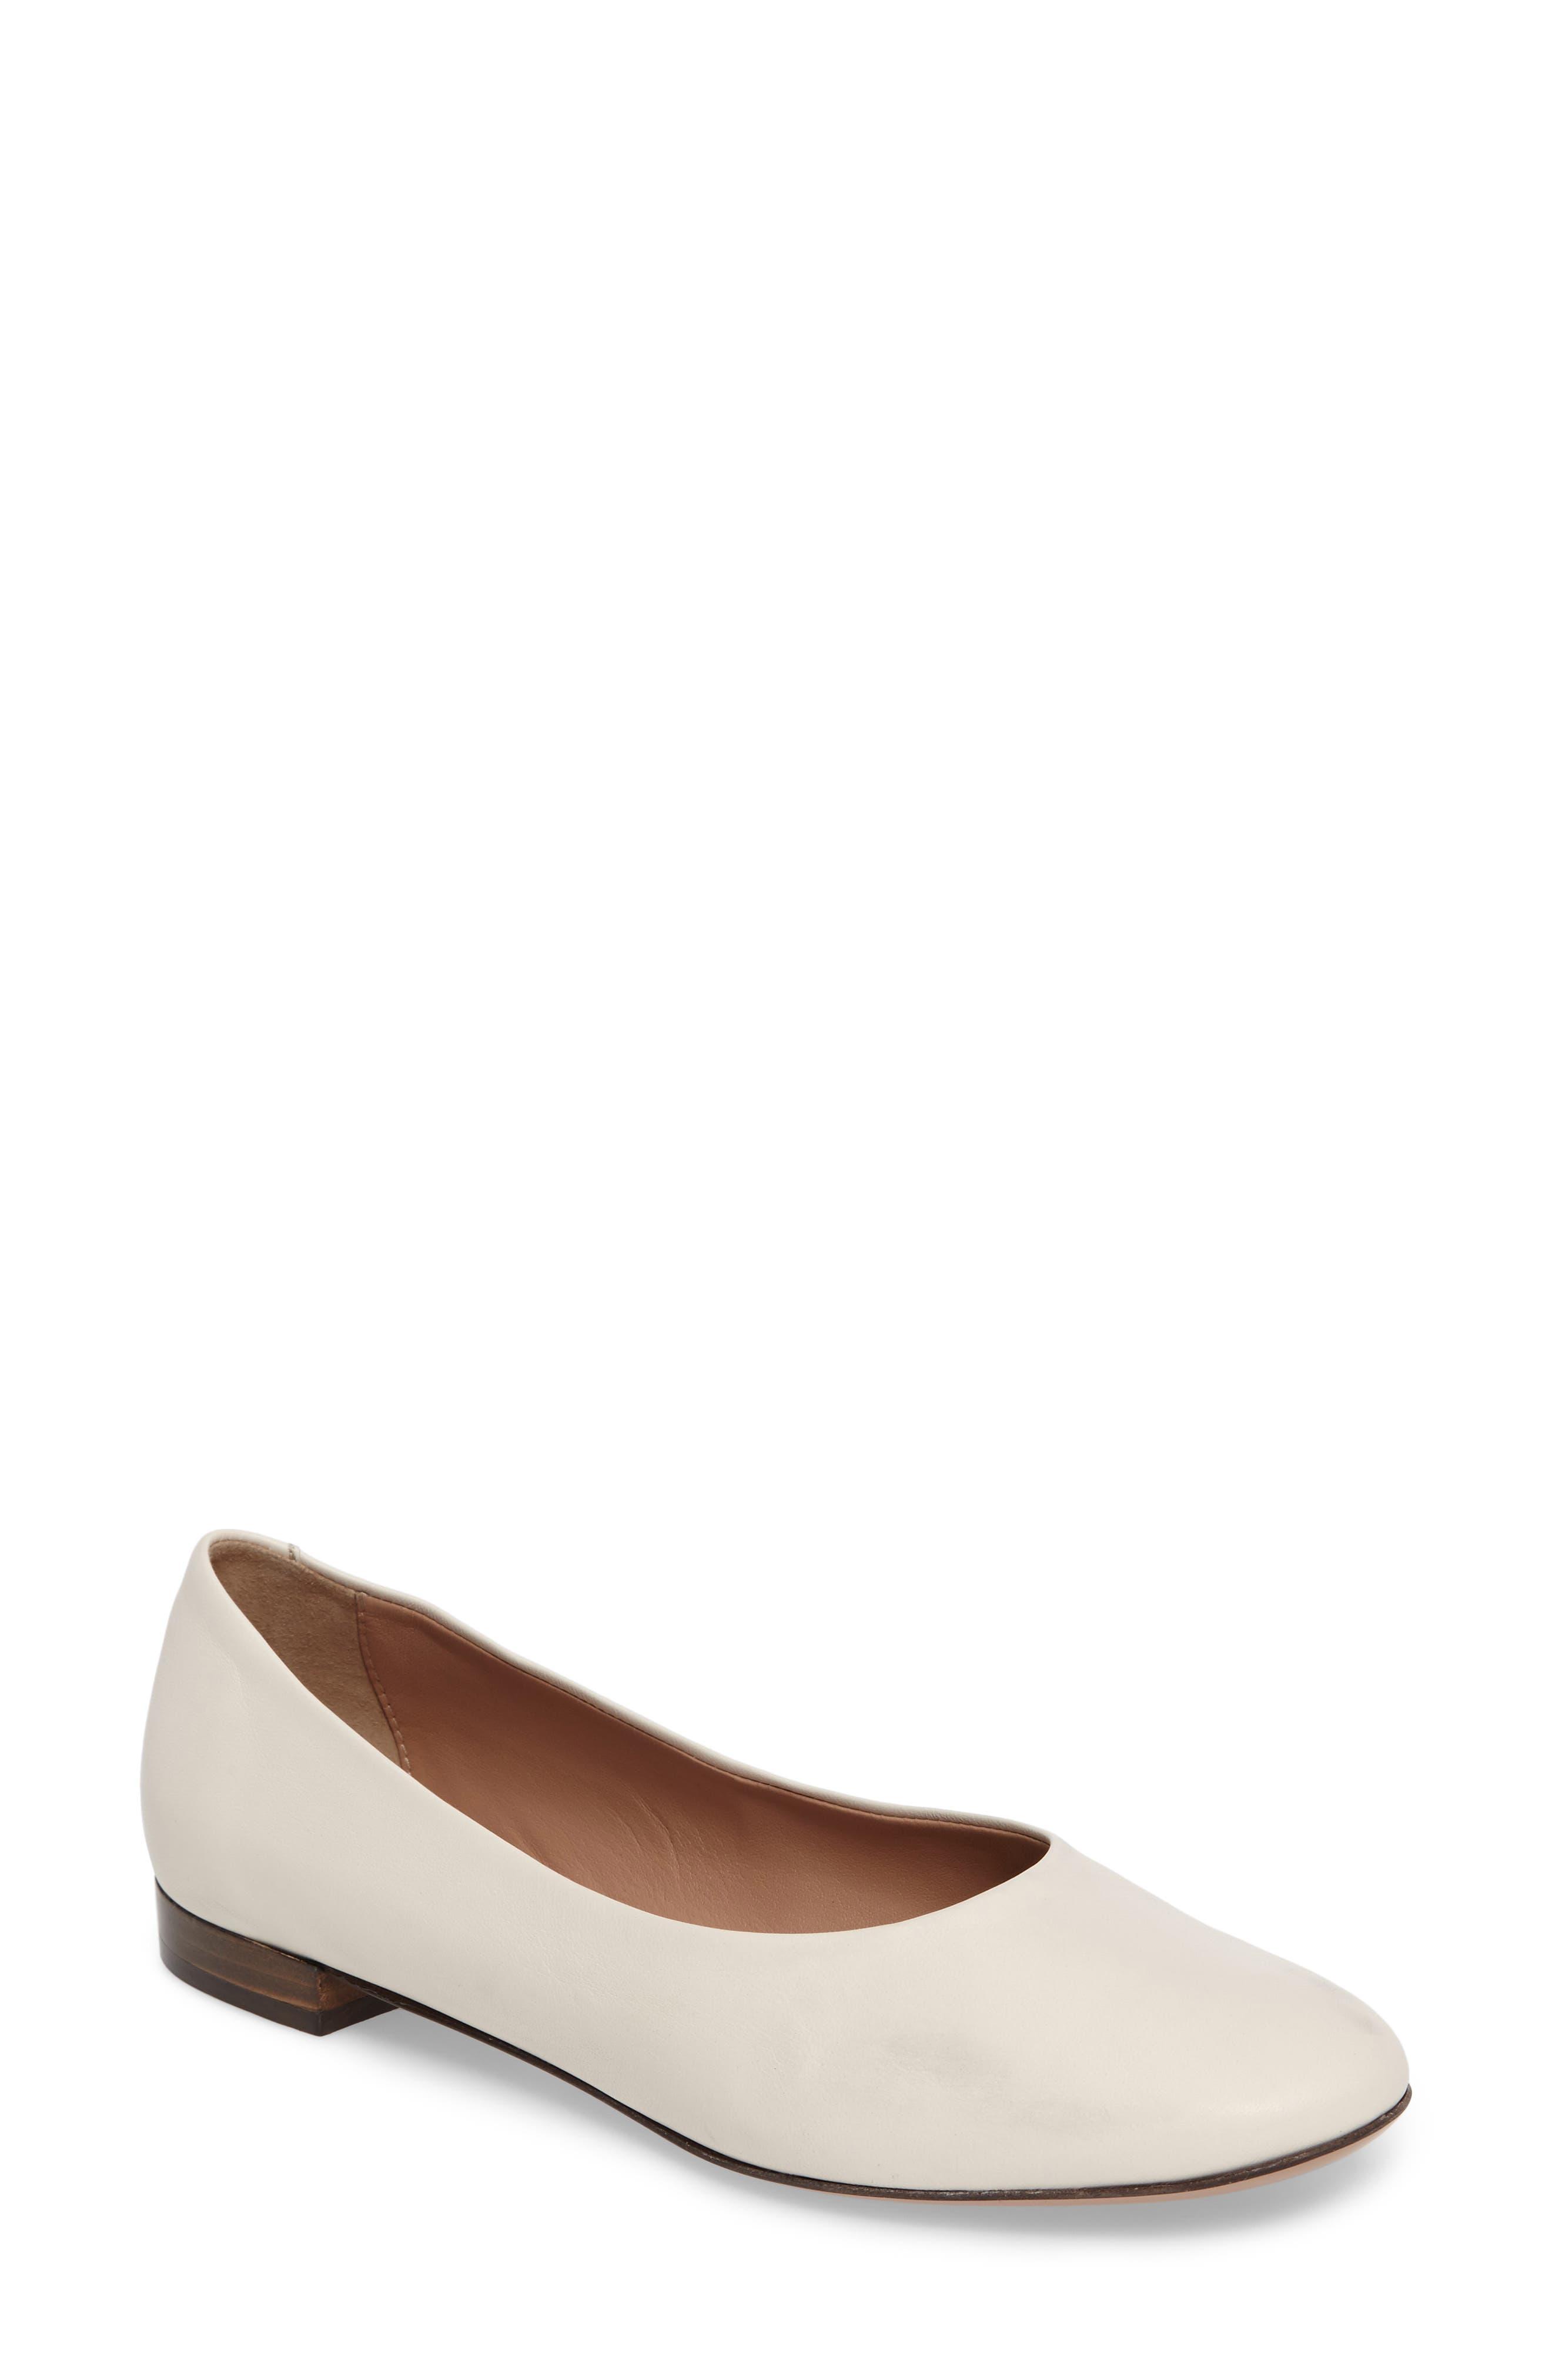 Gemma Ballerina Flat,                         Main,                         color, Bone Leather